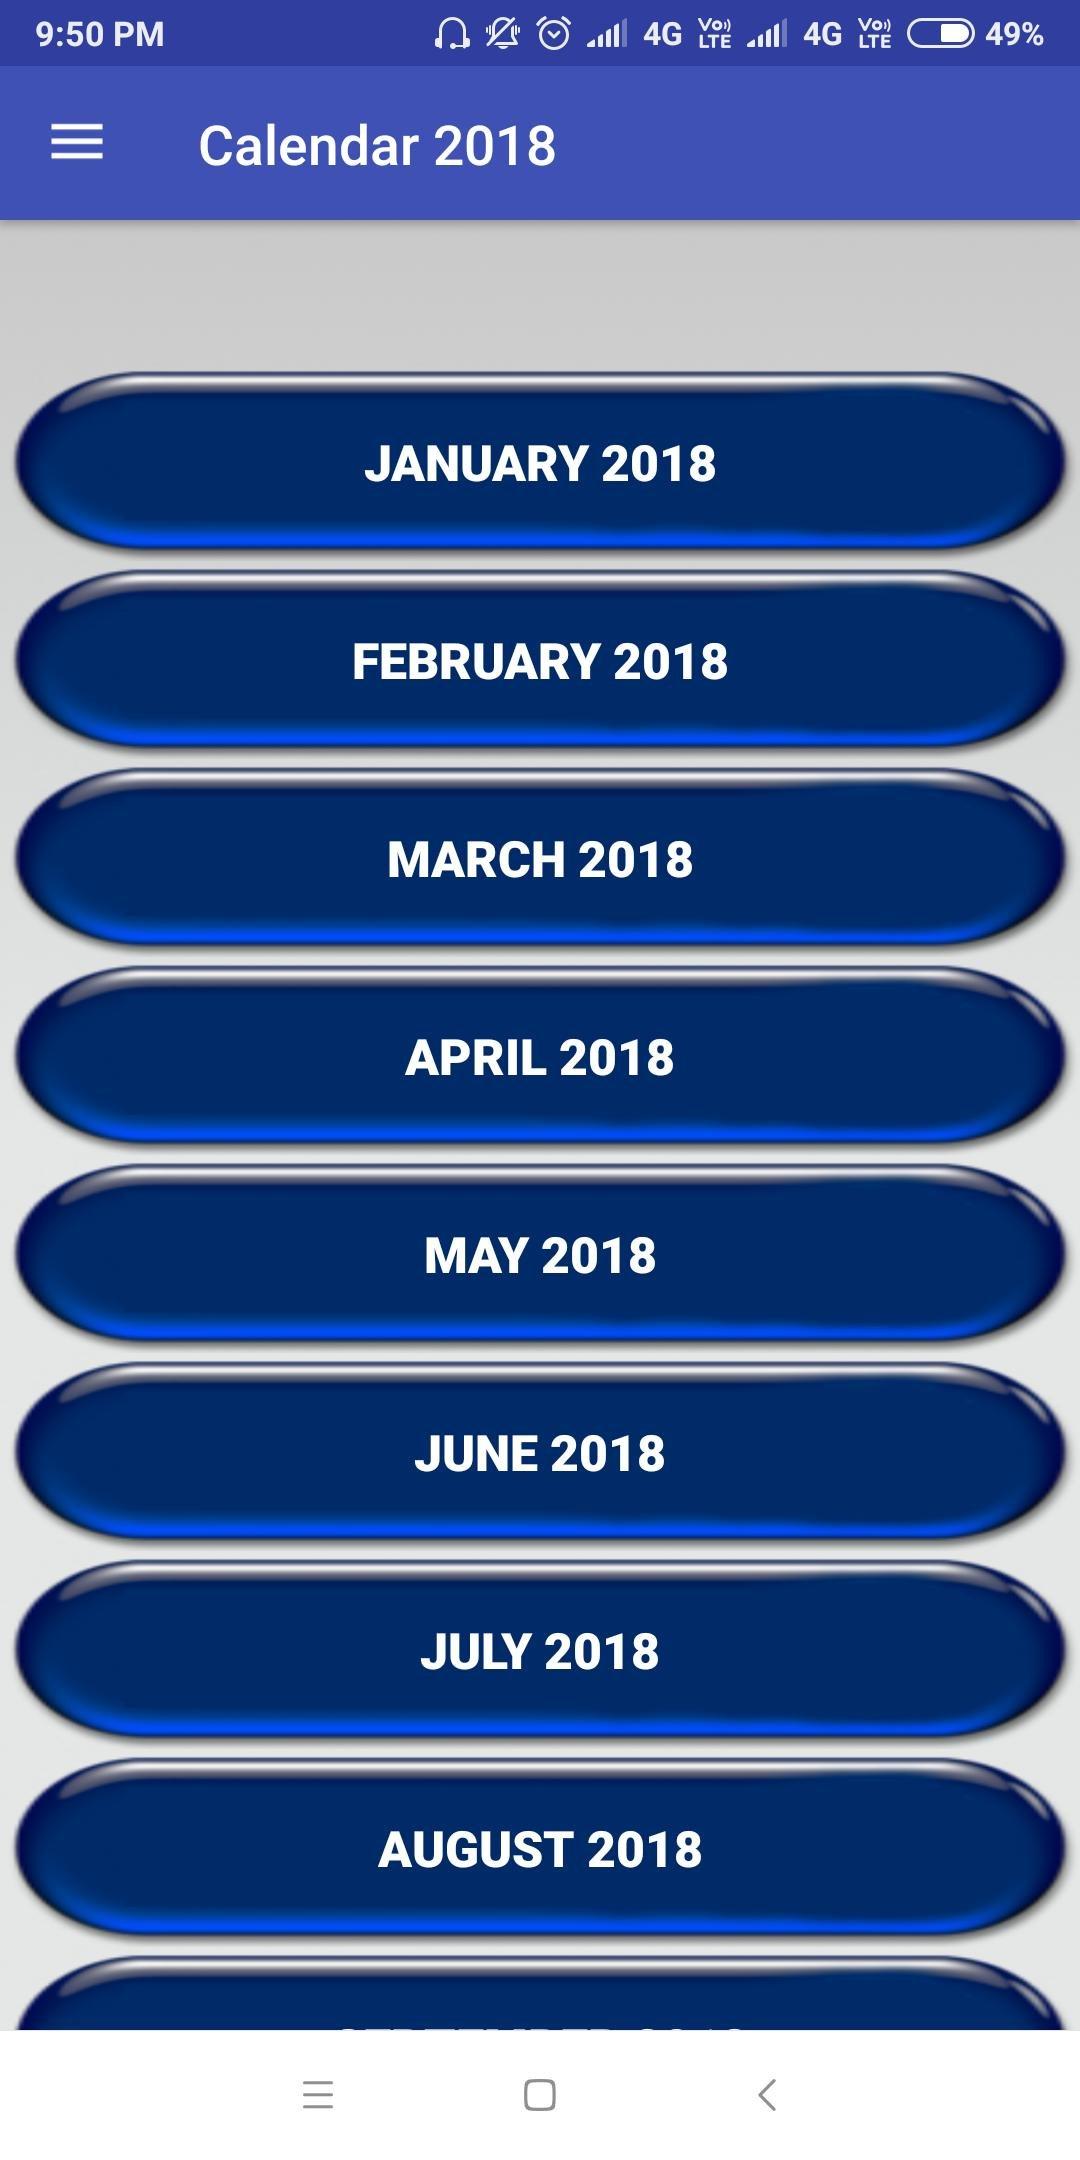 Gh Rh Calendar   Calendar   Foji/fauji Calendar For Android – Apk Calendar 2019 Rh Gh